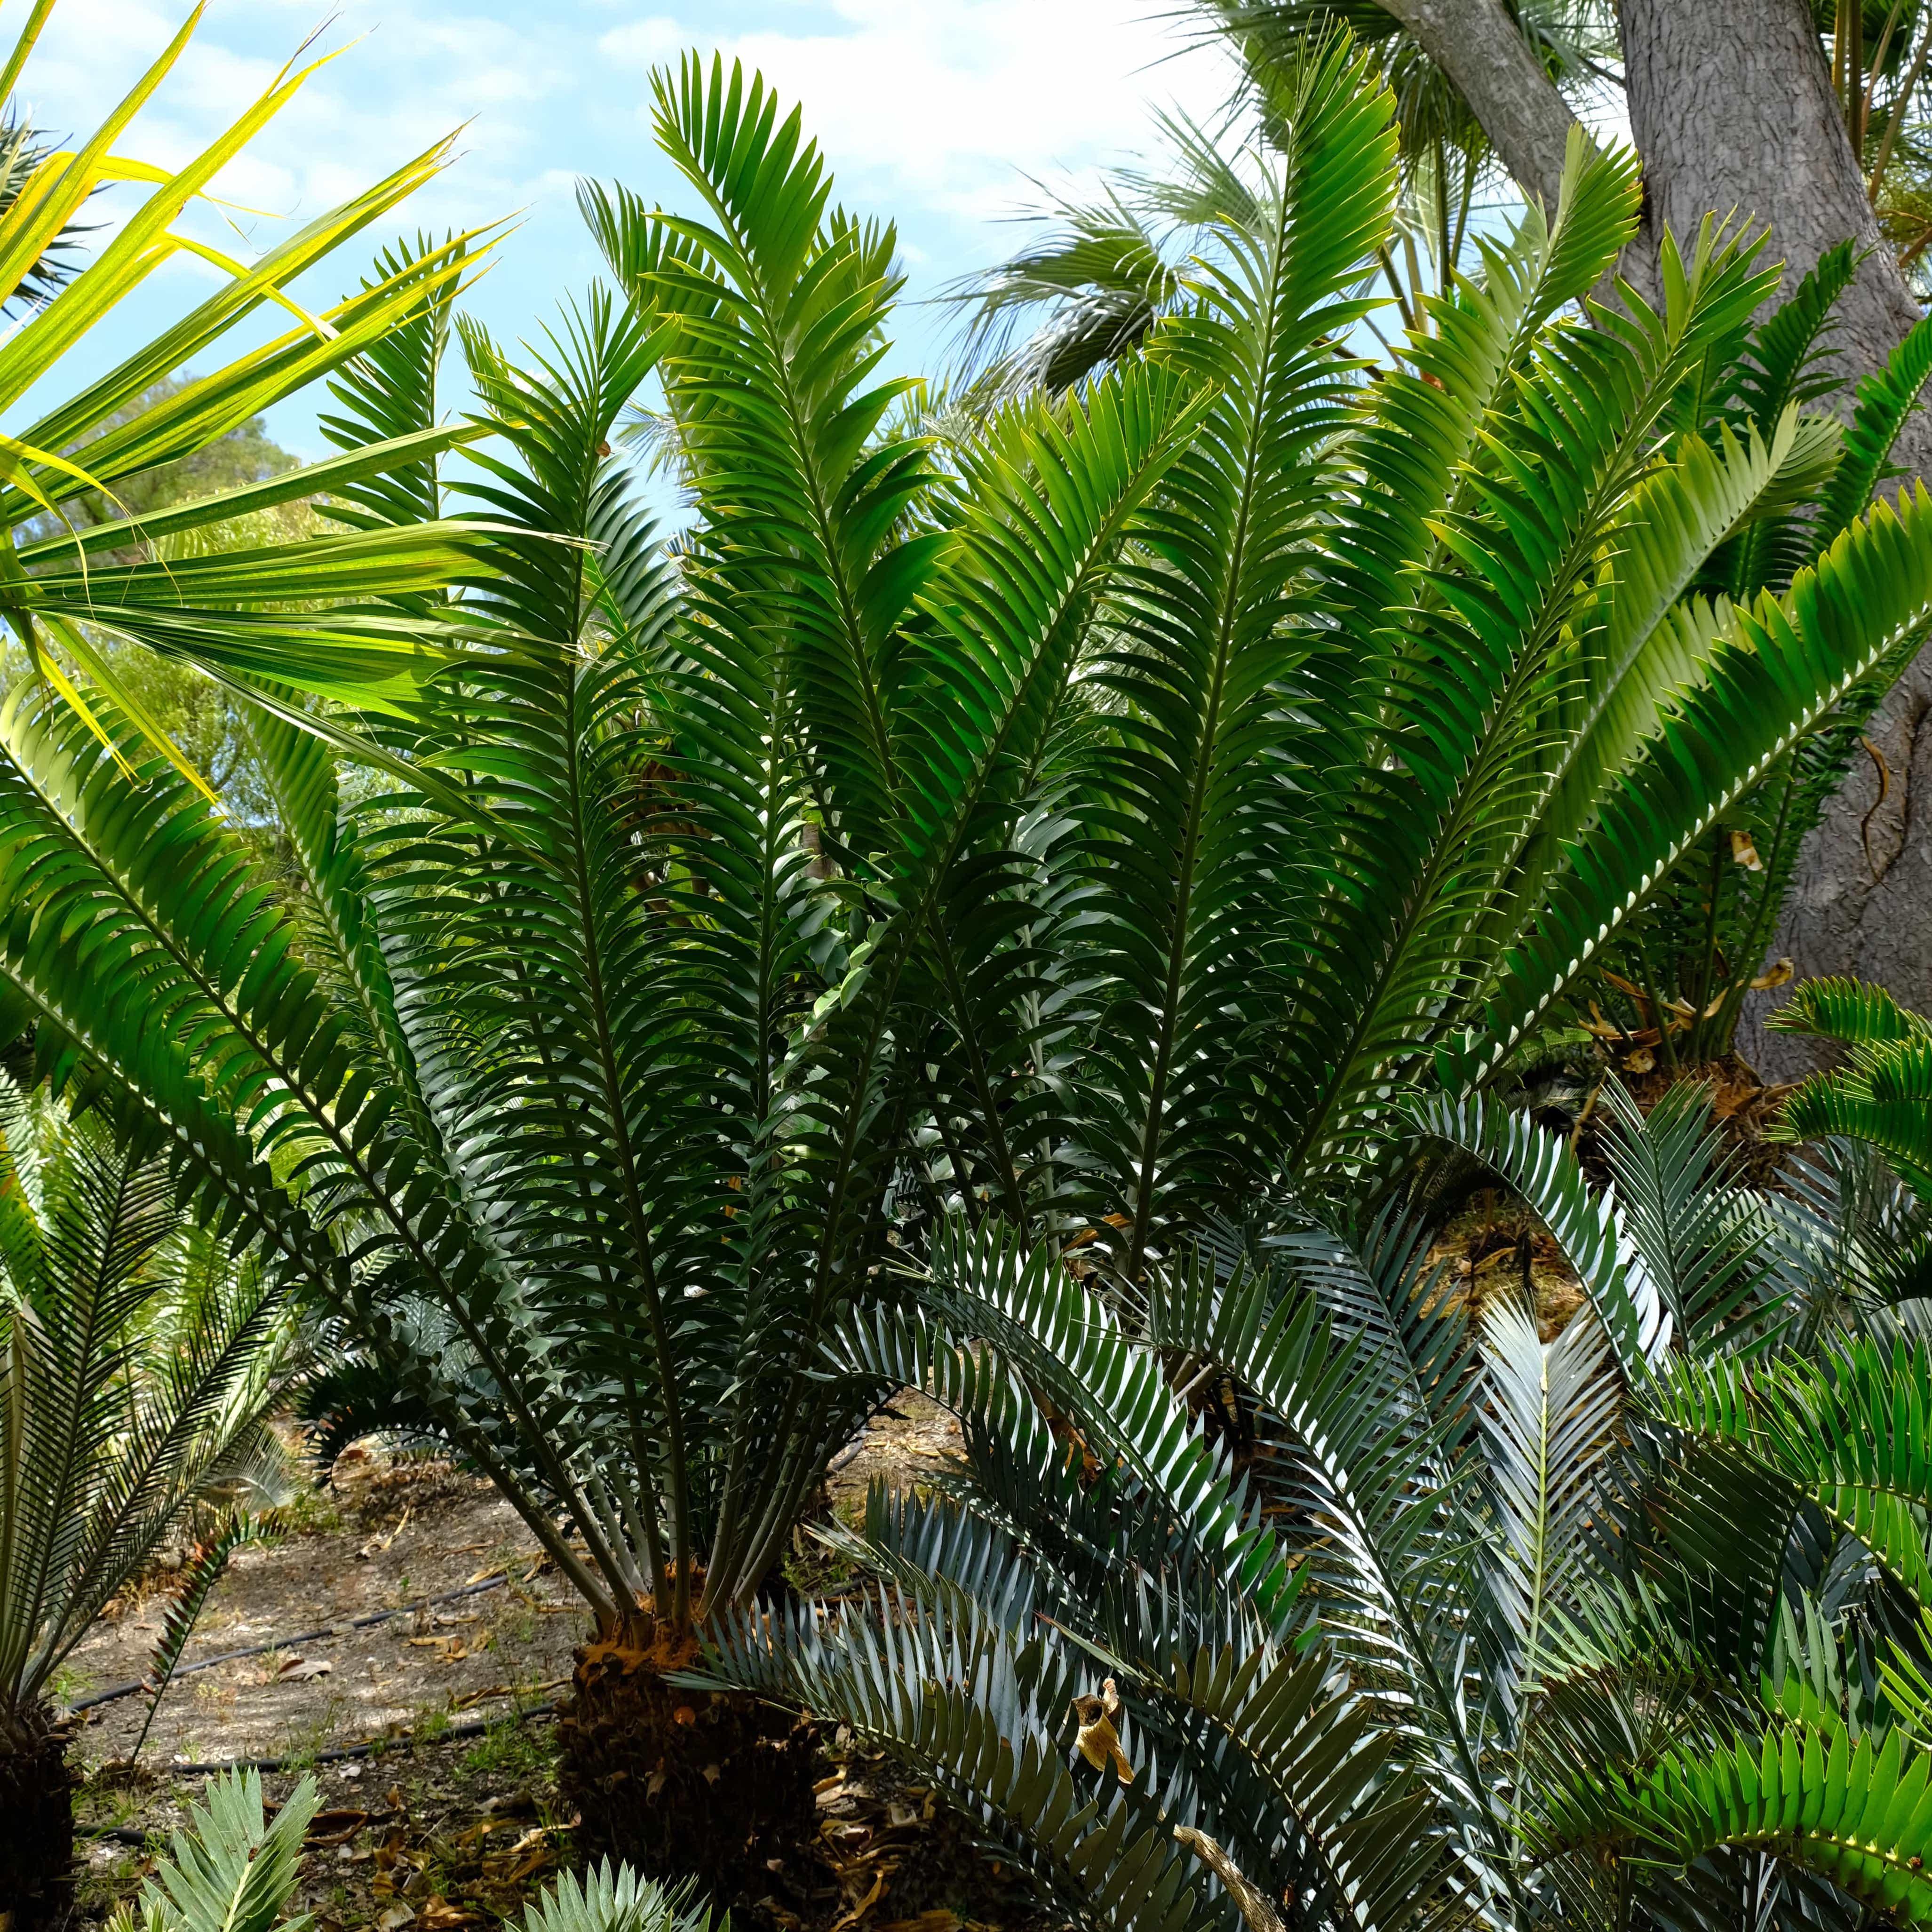 Encephalartos natalensis